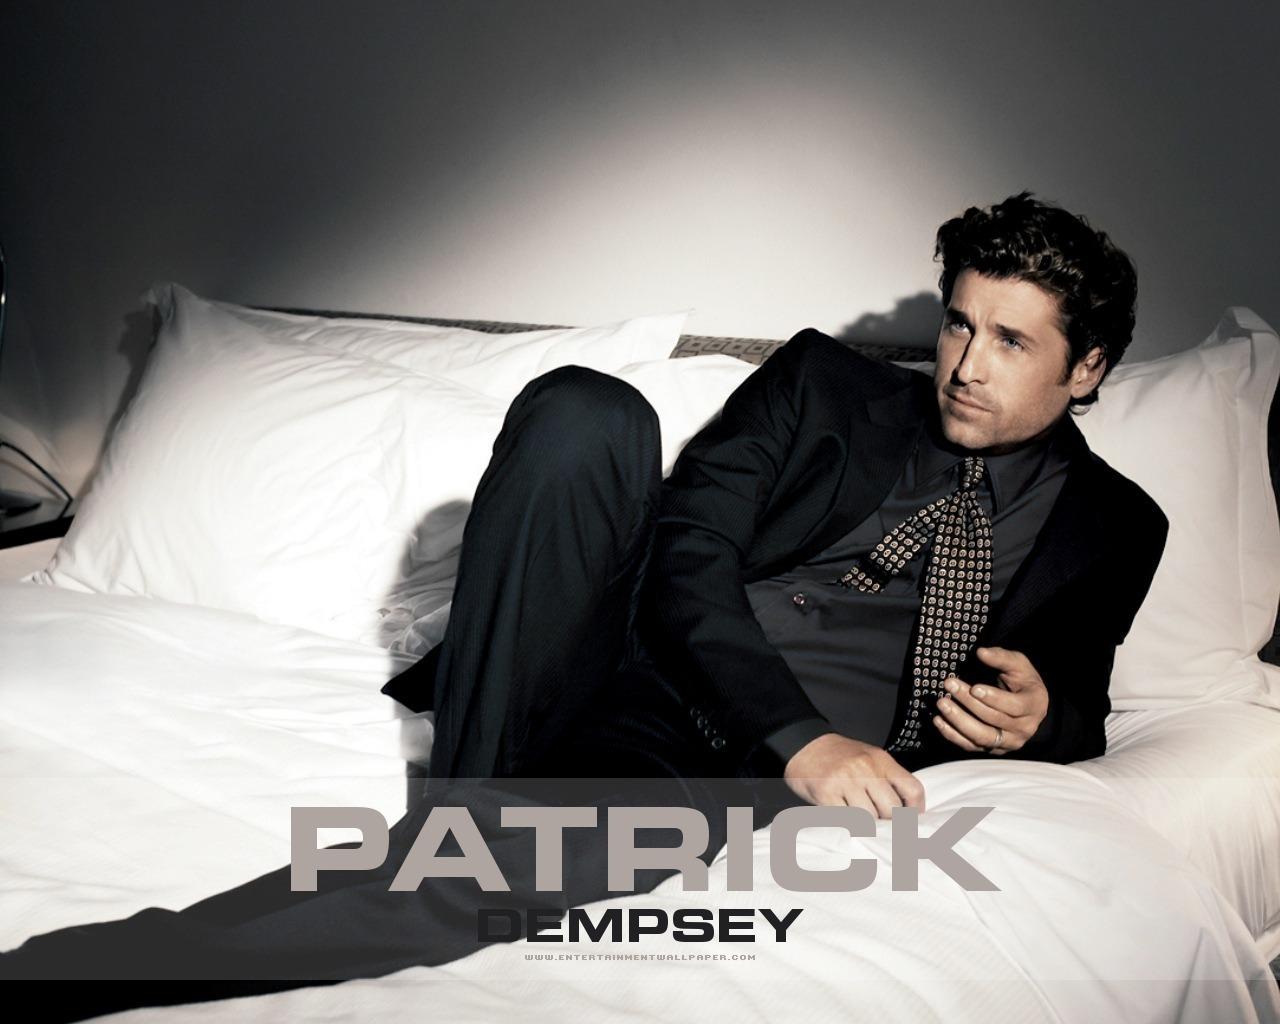 Patrick<3 - Patrick Dempsey 1280x1024